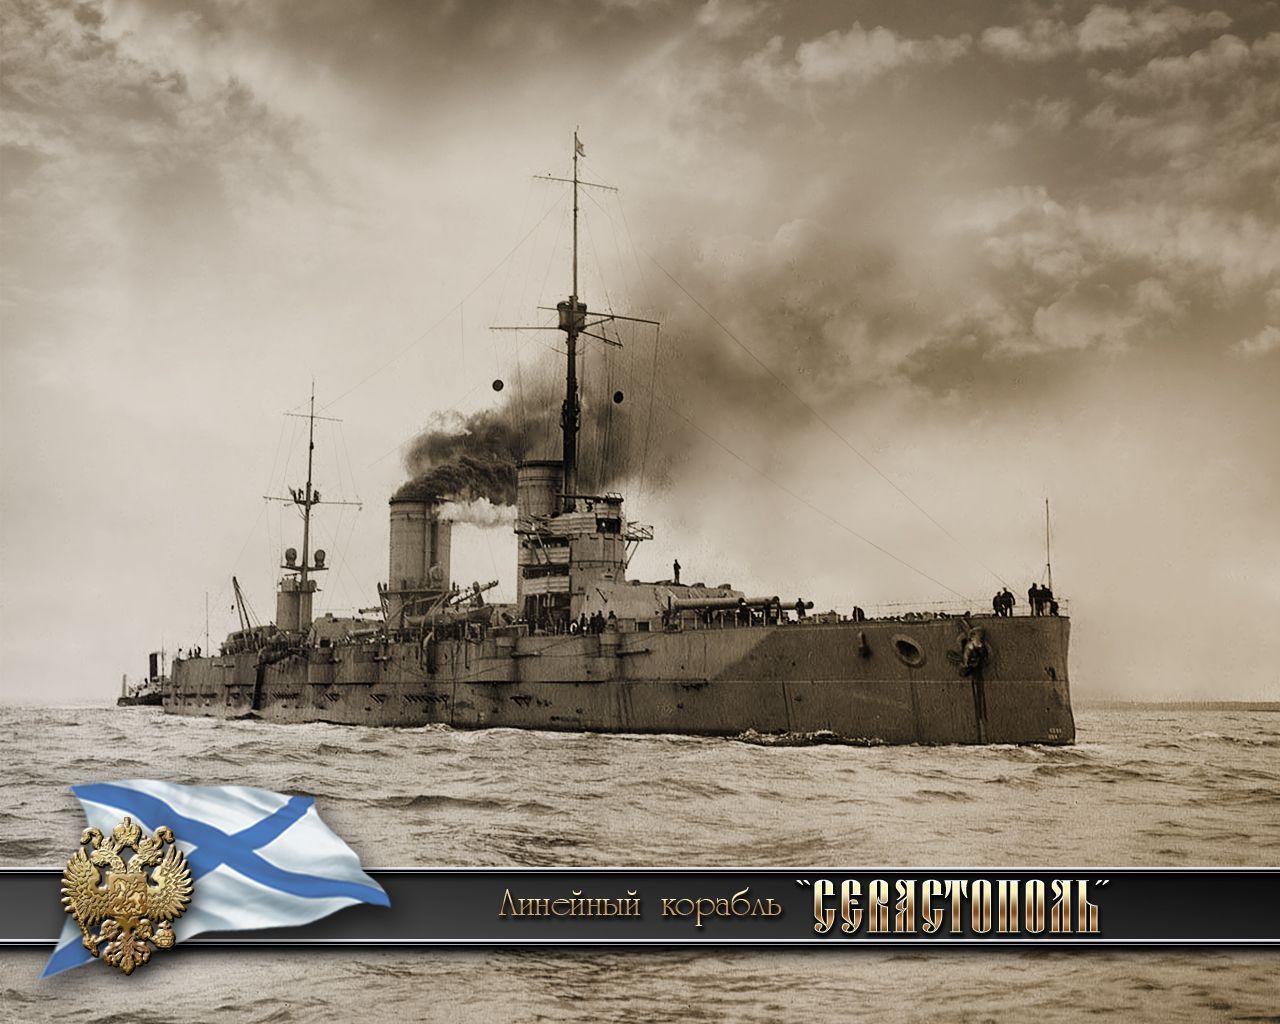 гречин императорский флот россии фото смартфон